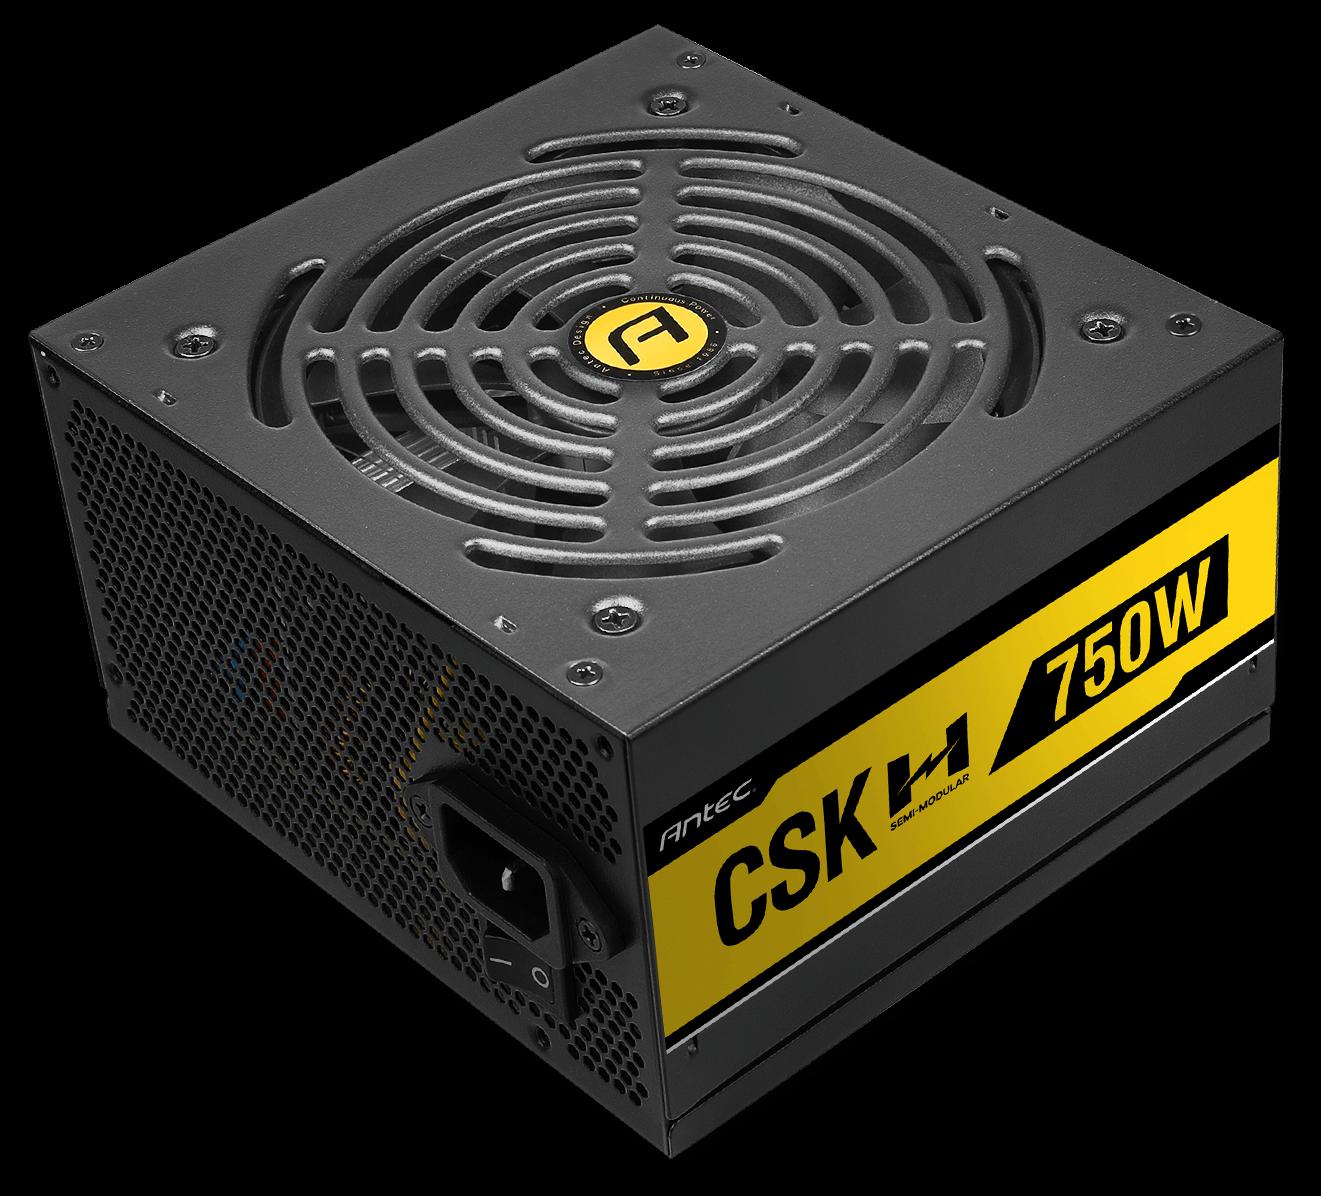 ANTEC CSK750H 80+BRONZE-overview